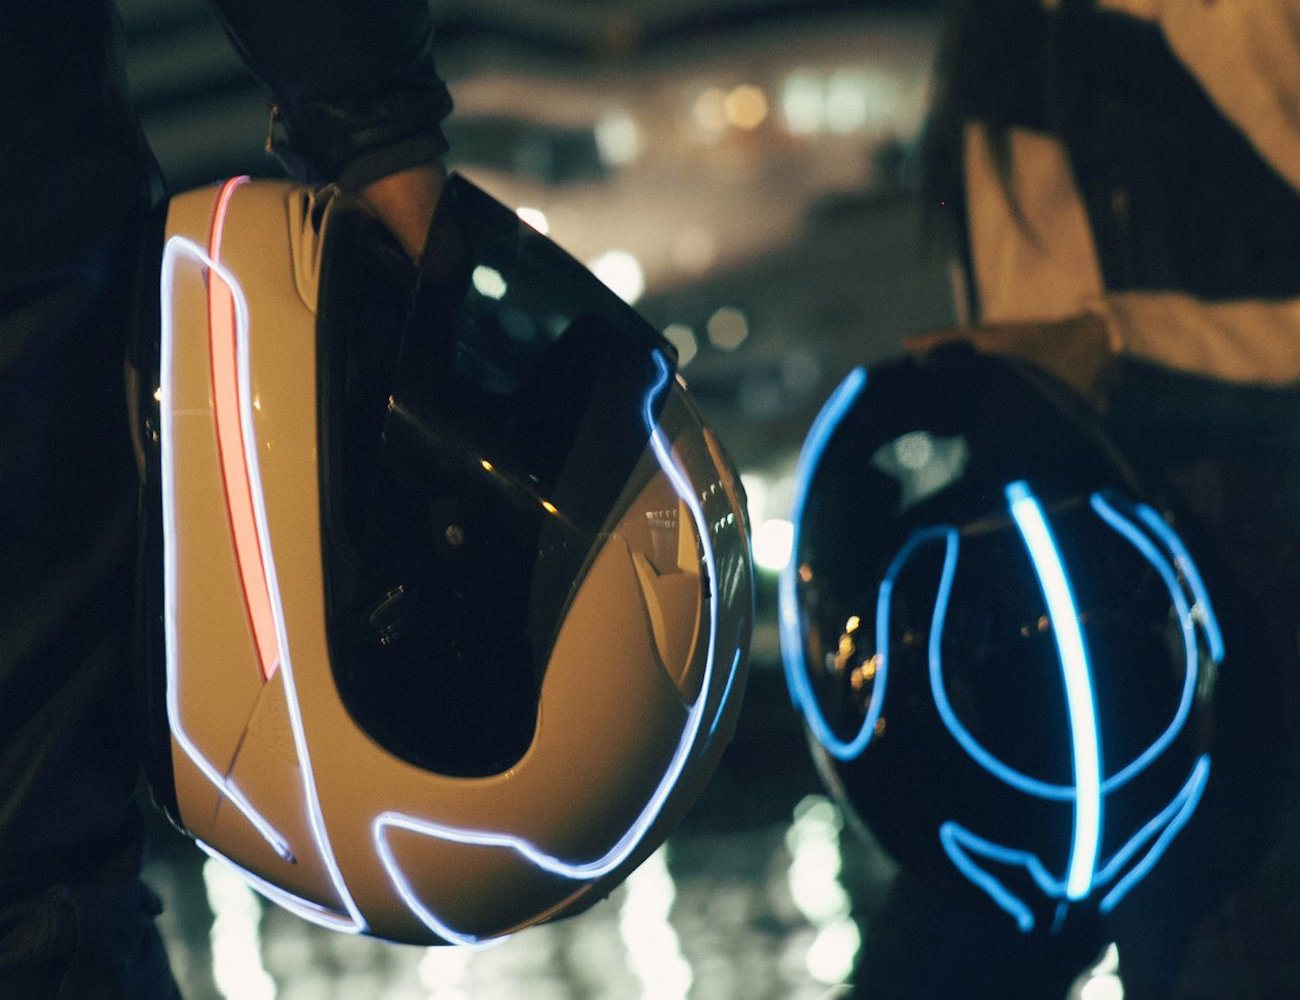 LightMode Electroluminescent Motorcycle Helmet Kit » Gadget Flow